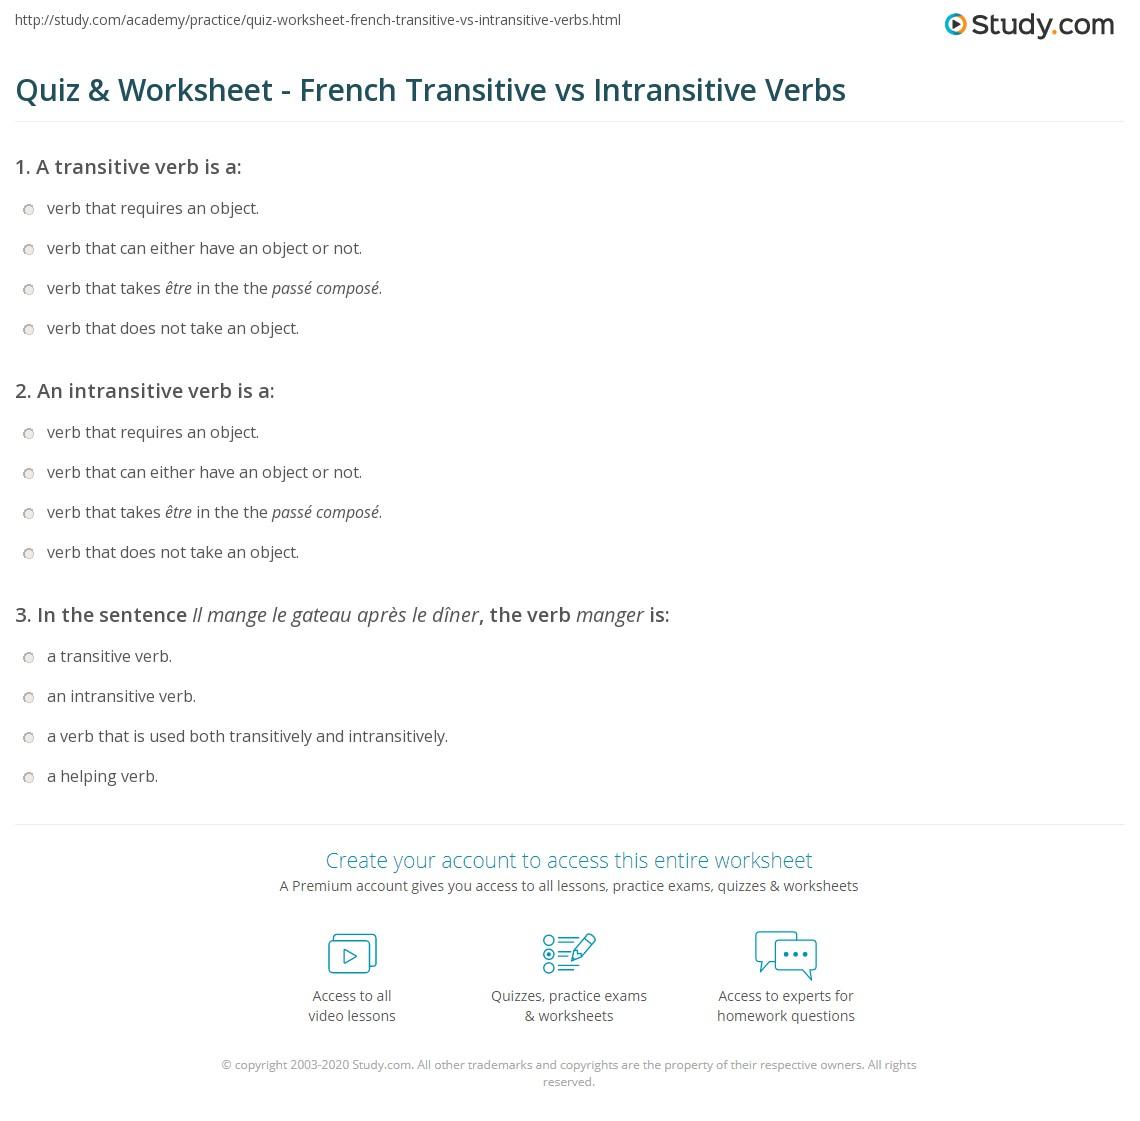 Workbooks transitive and intransitive verbs worksheets : Quiz & Worksheet - French Transitive vs Intransitive Verbs | Study.com